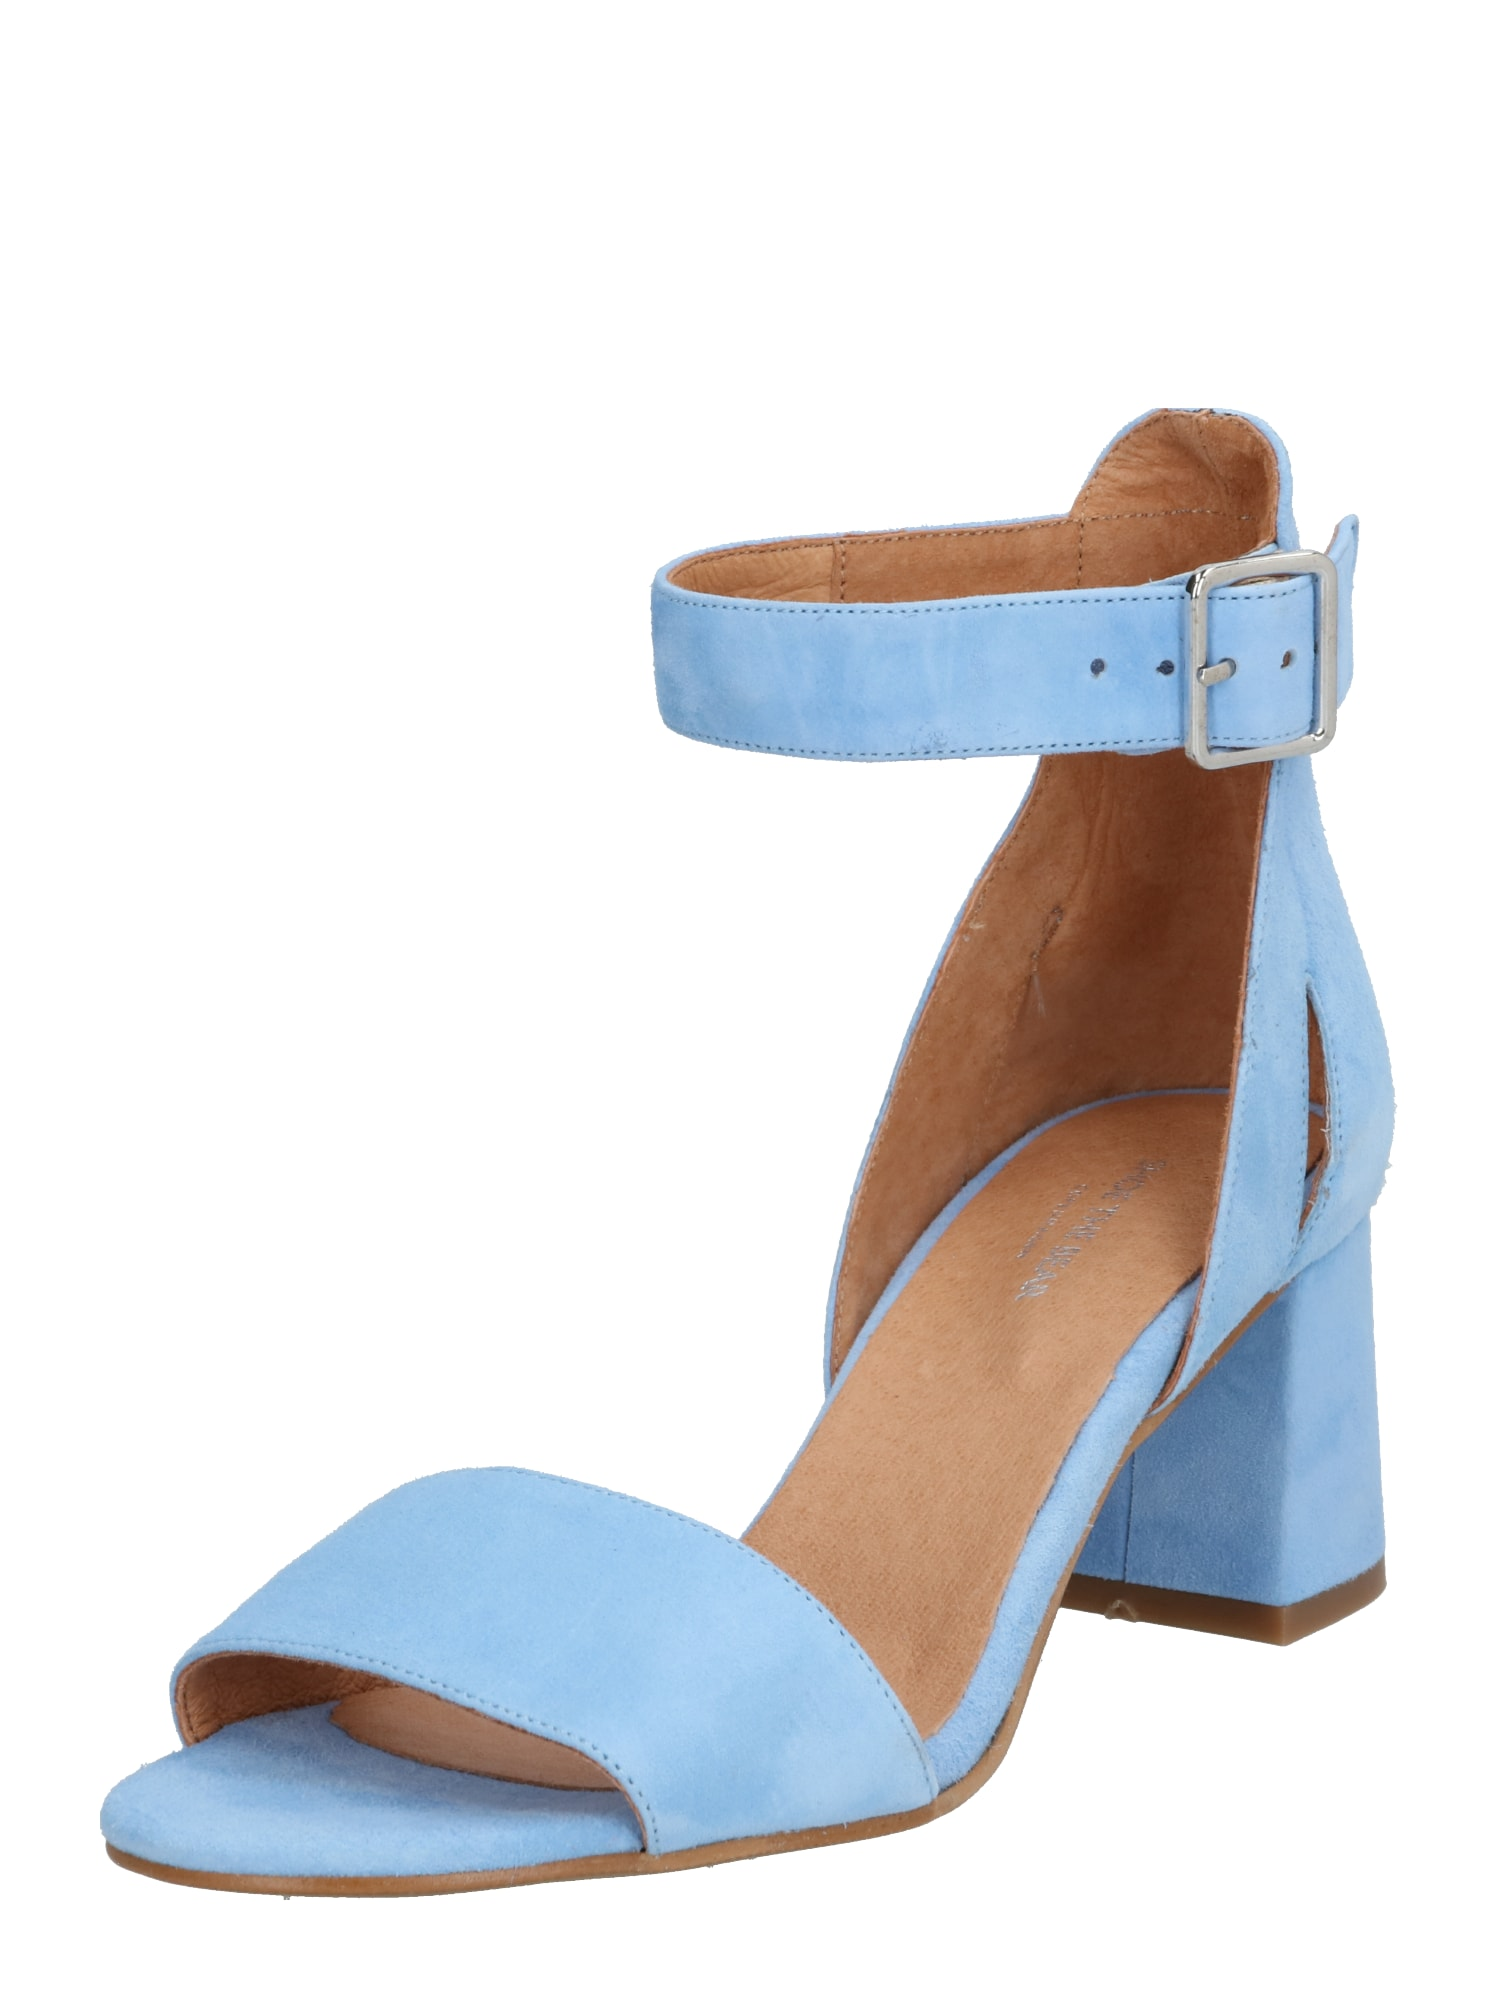 Shoe The Bear Sandalai 'May S' šviesiai mėlyna